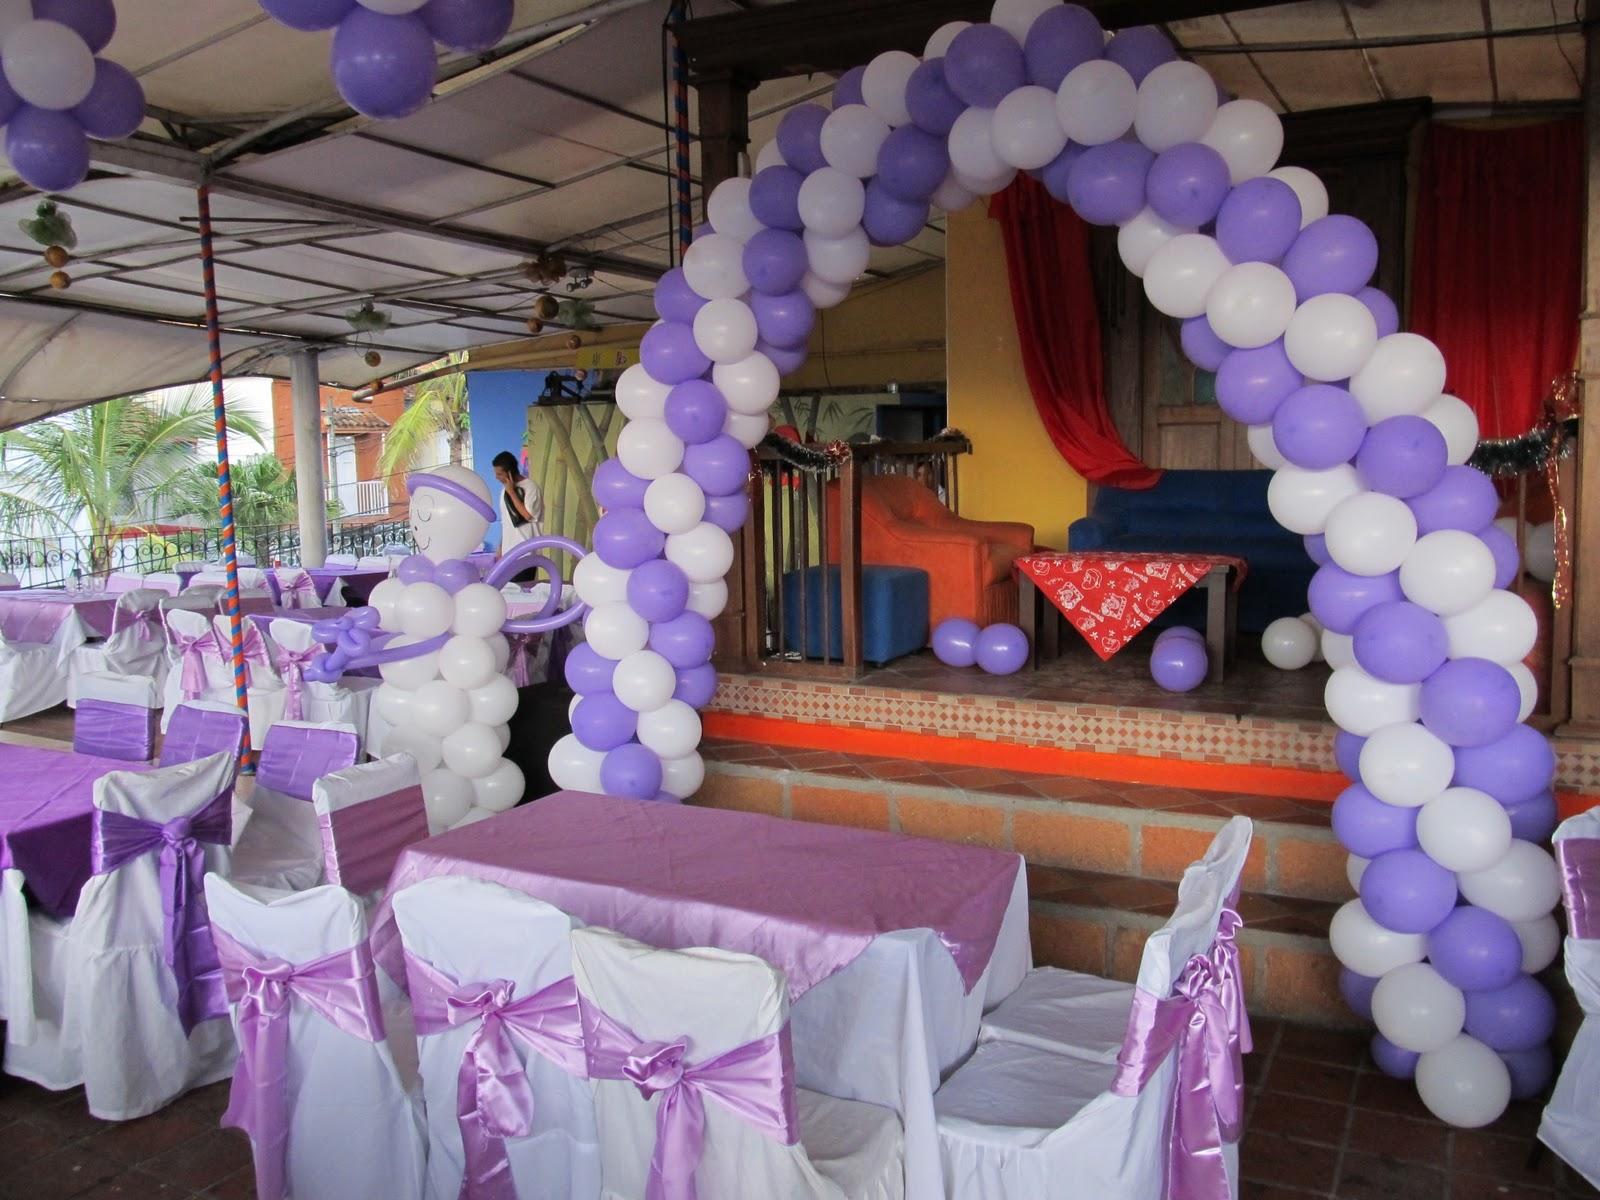 Decoracion con globos primera comunion recreacionistas for Fiestas comunion decoracion